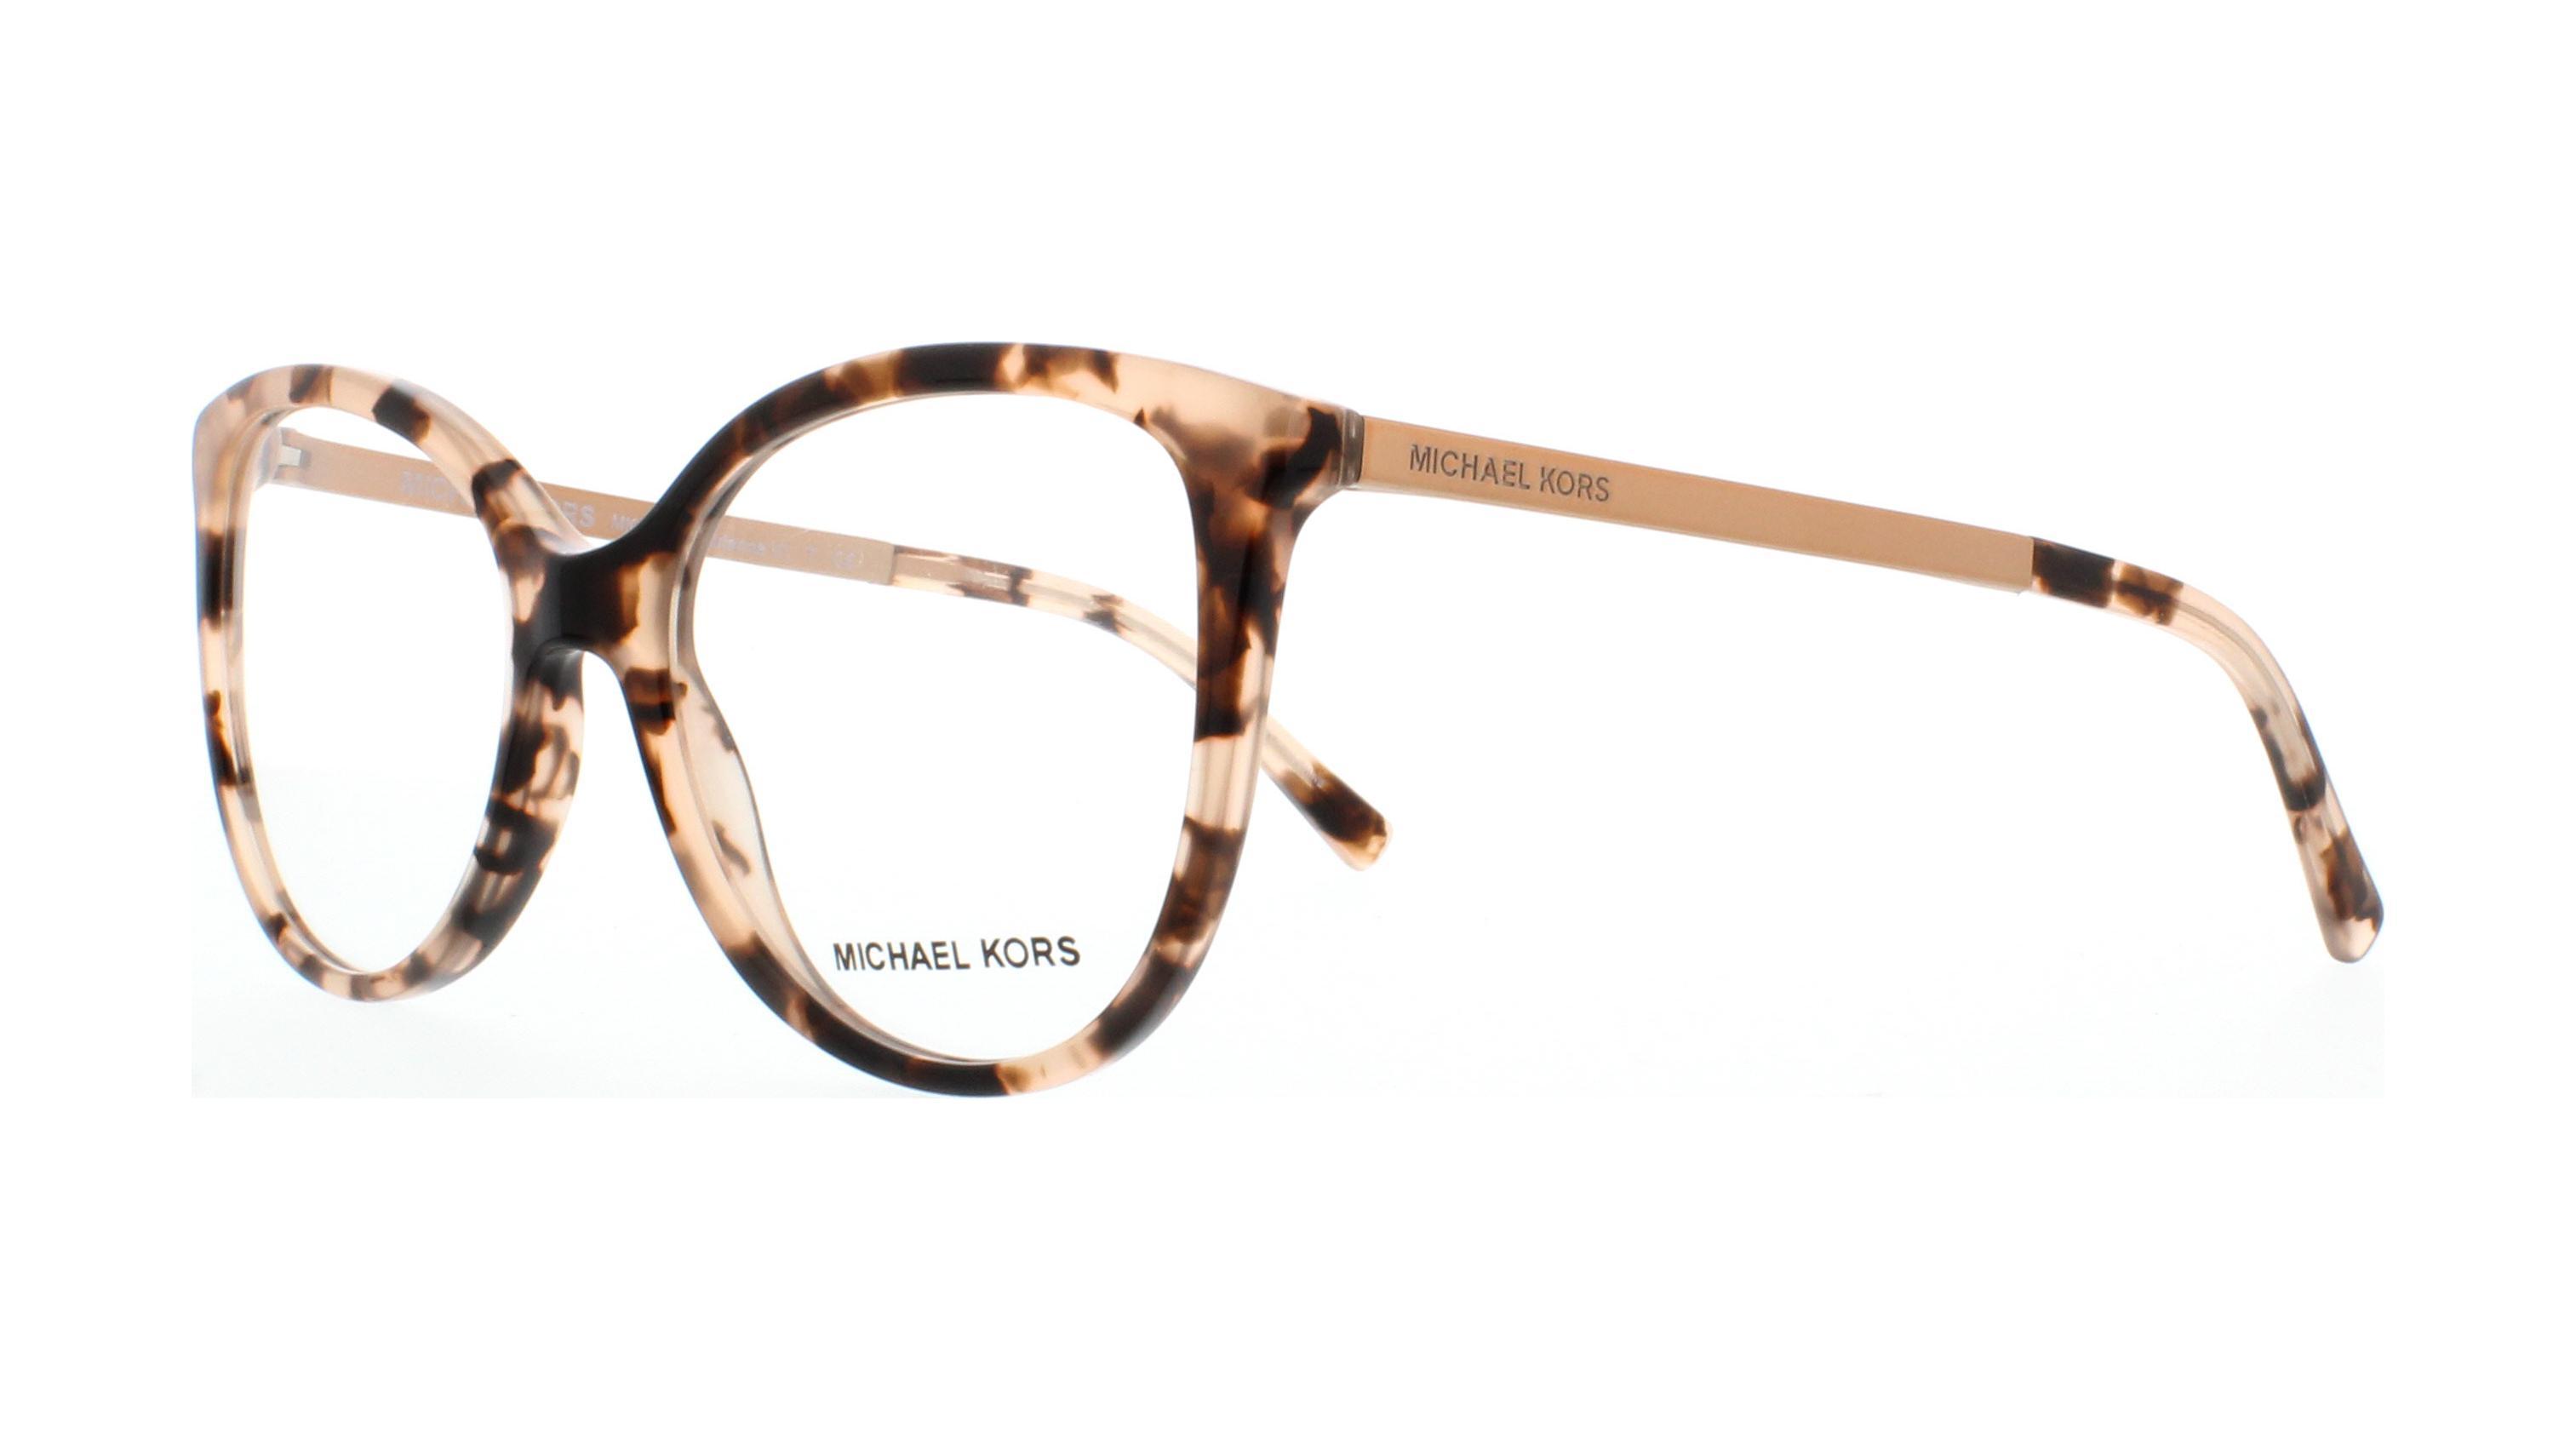 f67d52fb51c0 MICHAEL KORS Eyeglasses MK4034 ANTHEIA 3205 Pink Tortoise 52MM ...